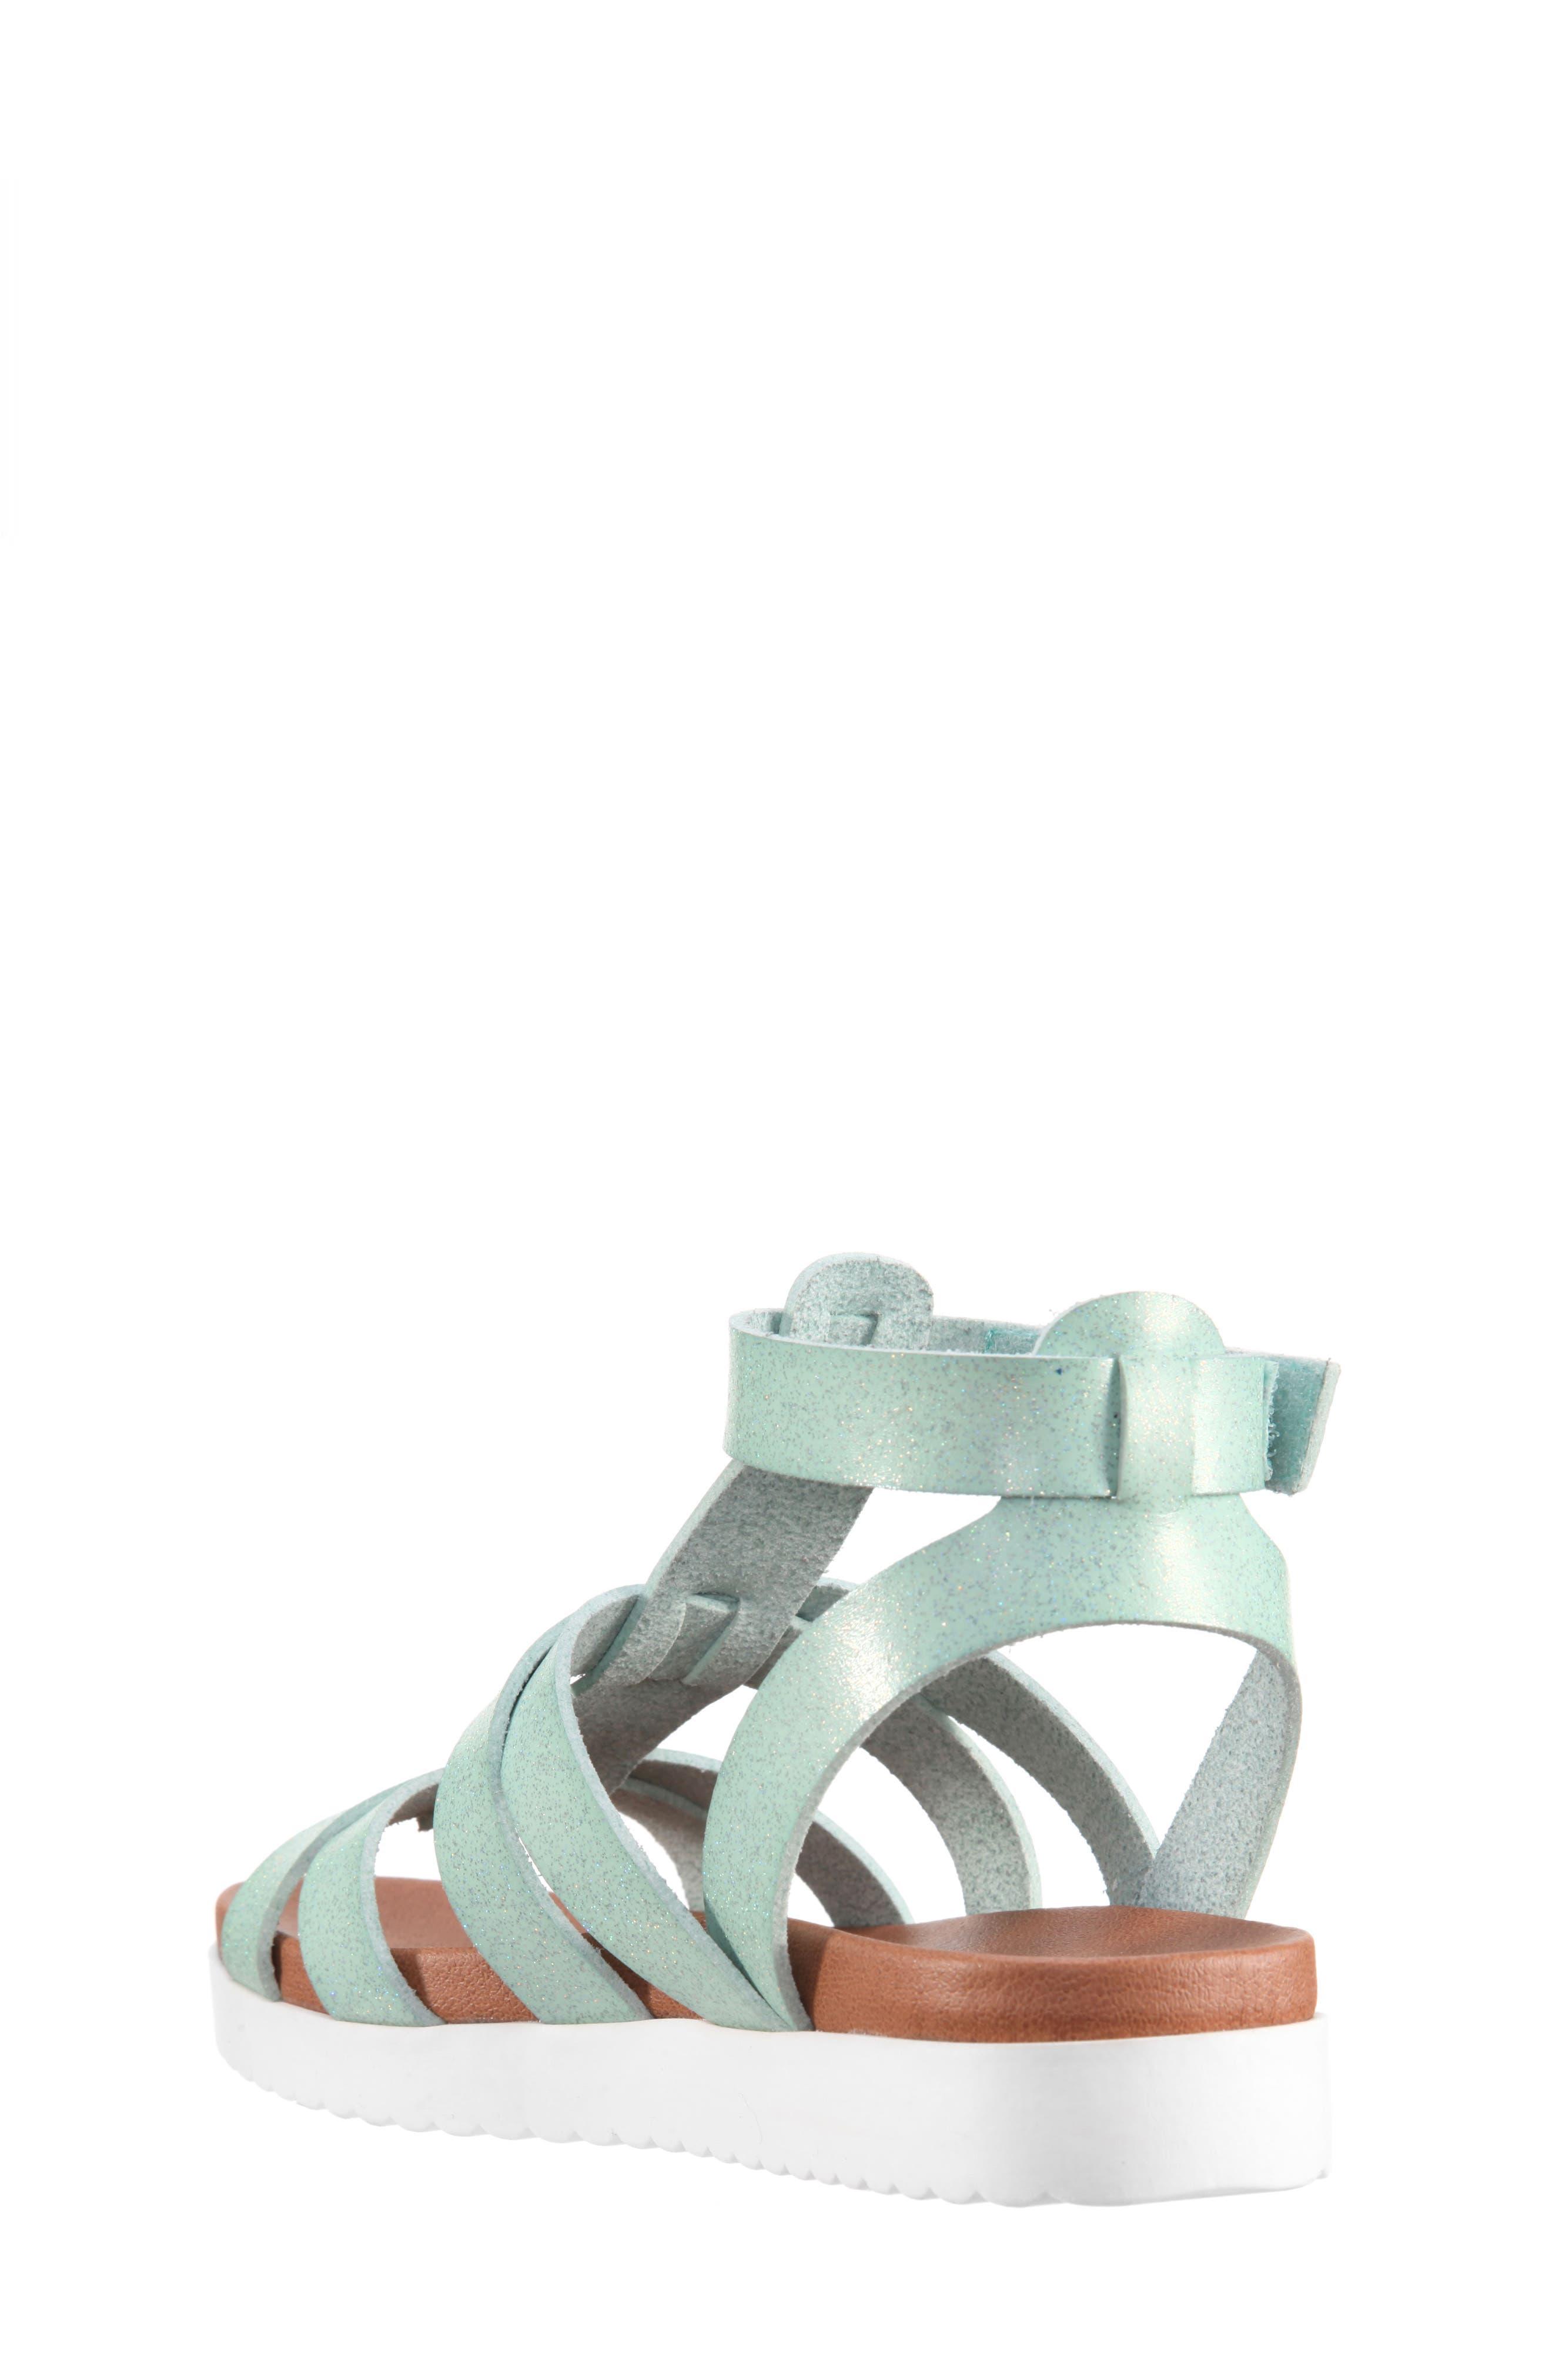 Alpha Gladiator Sandal,                             Alternate thumbnail 2, color,                             Mint Dip Dye